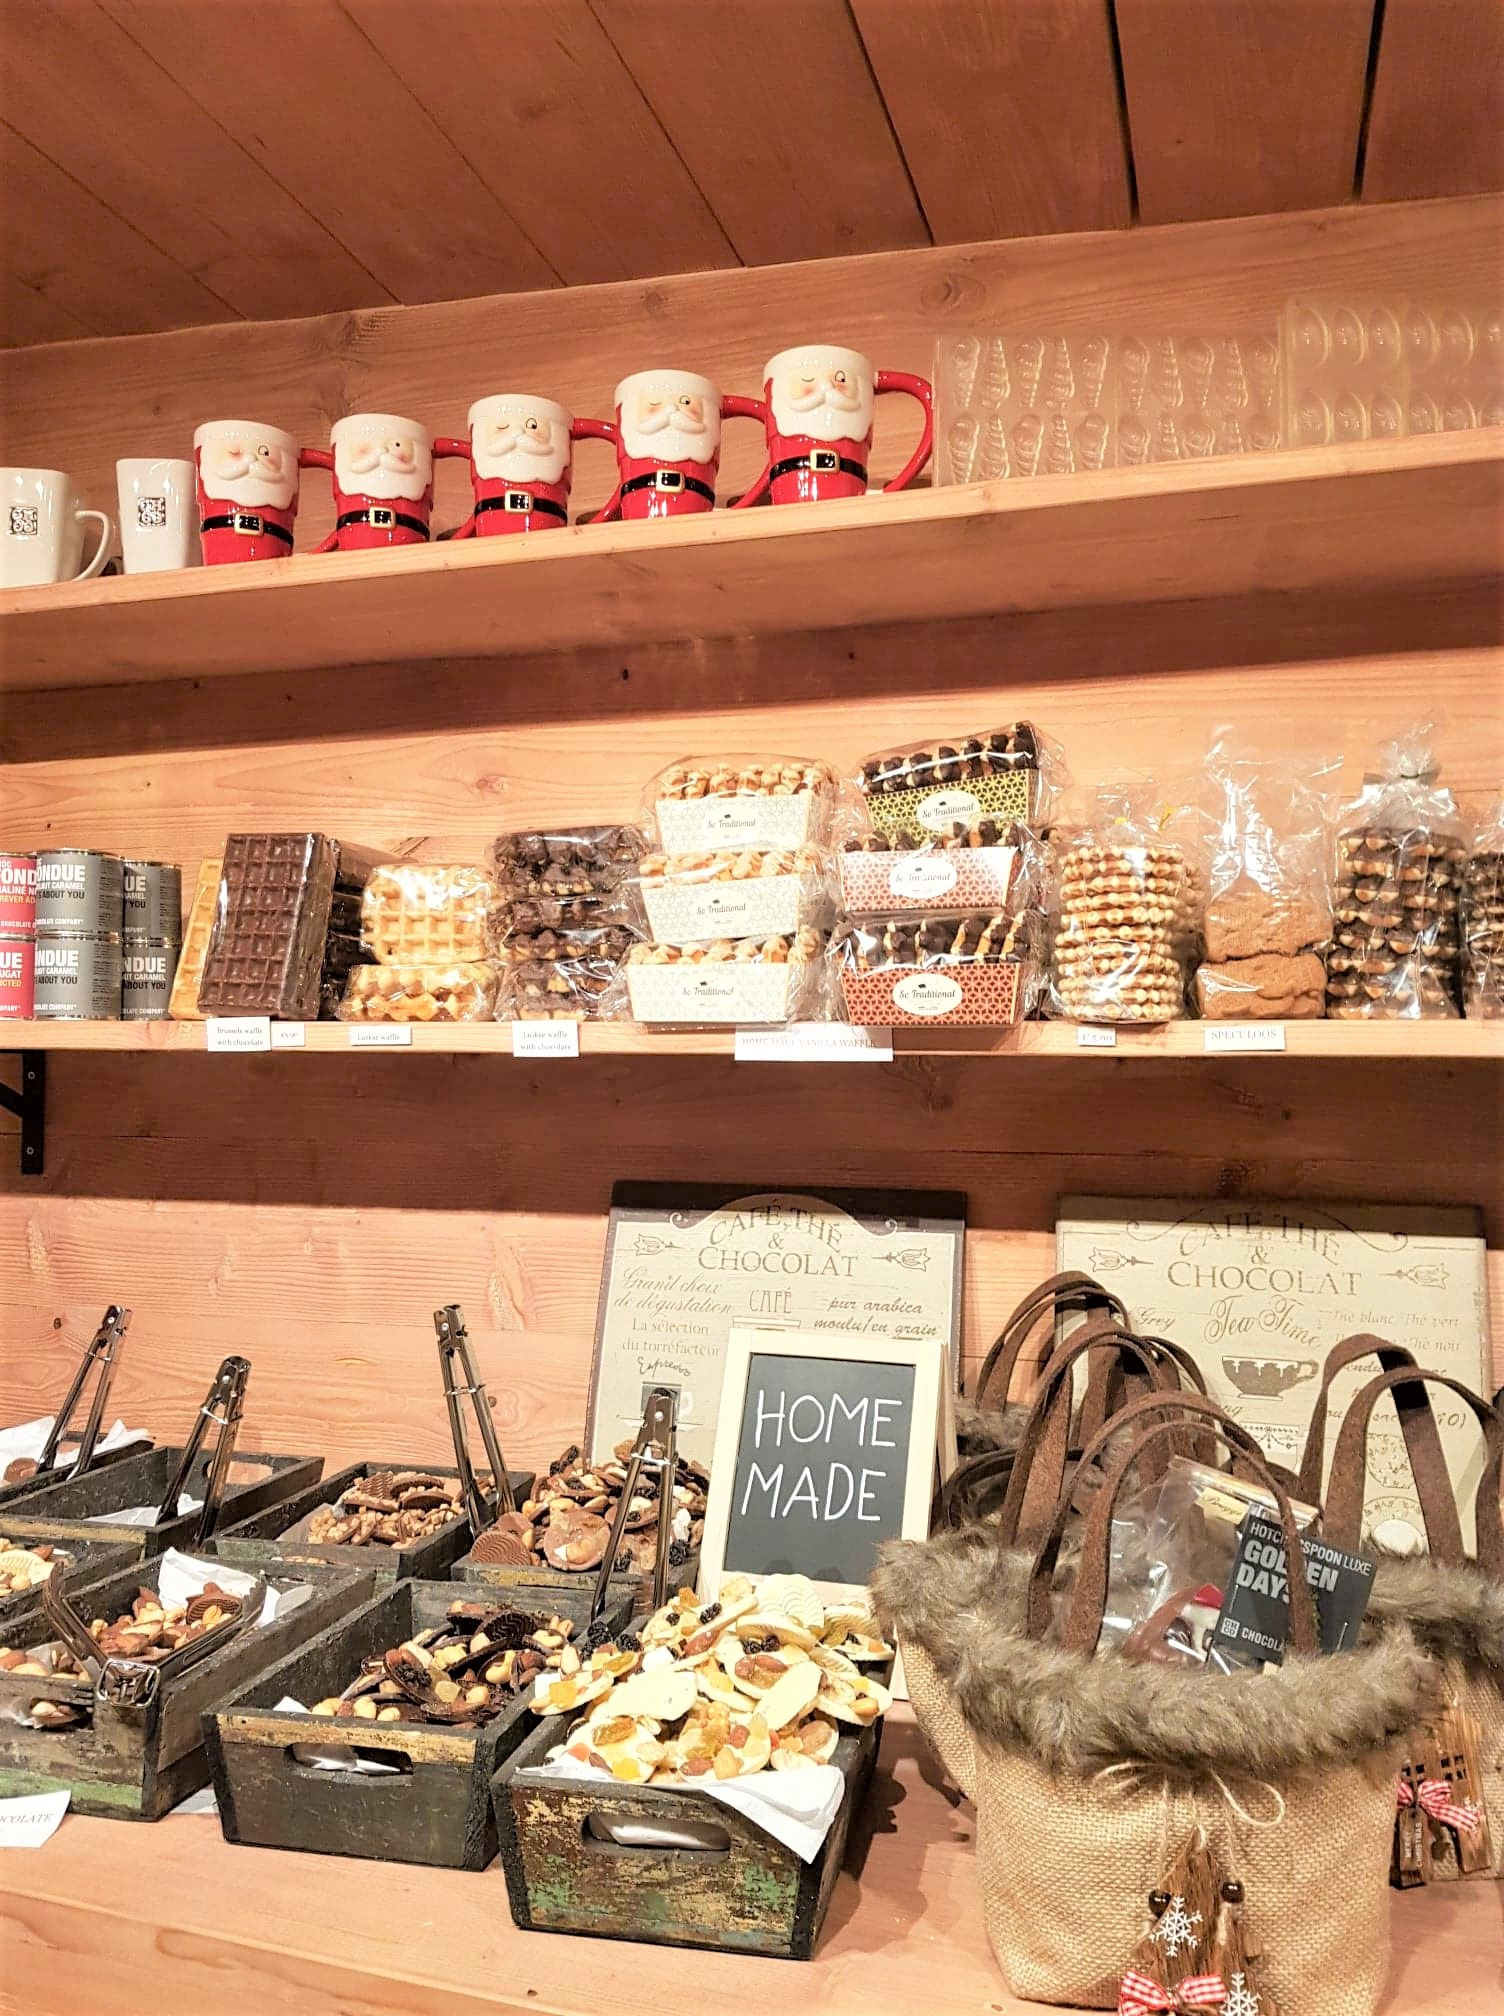 Belgique blog voyage clioandco chocolatier The chocolate kiss